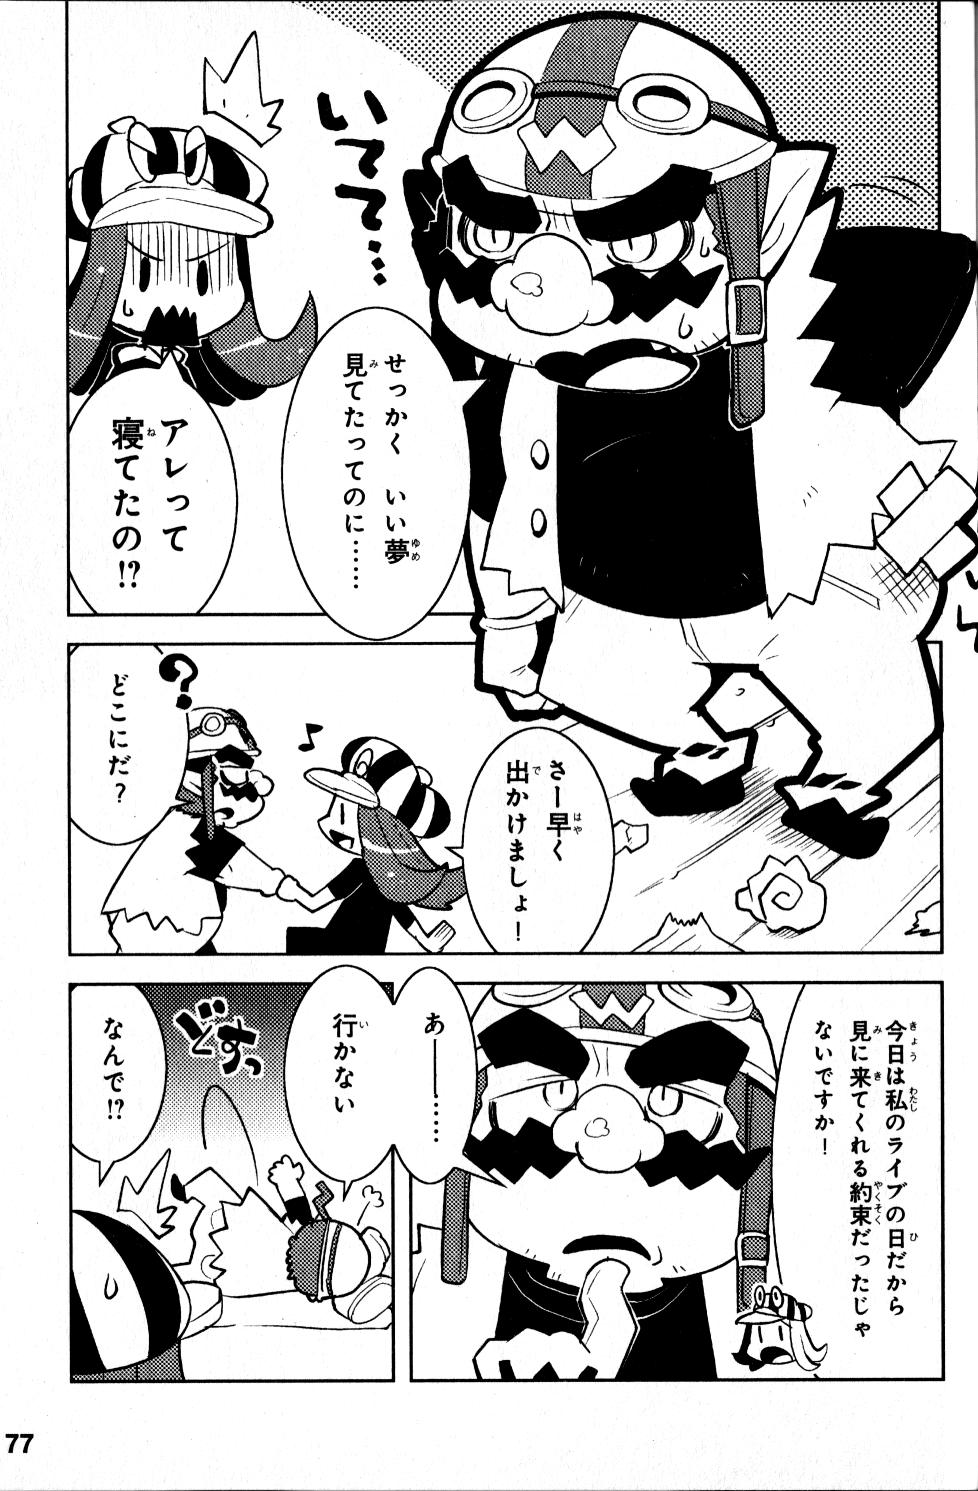 fami2comic06-02-wario03.JPG